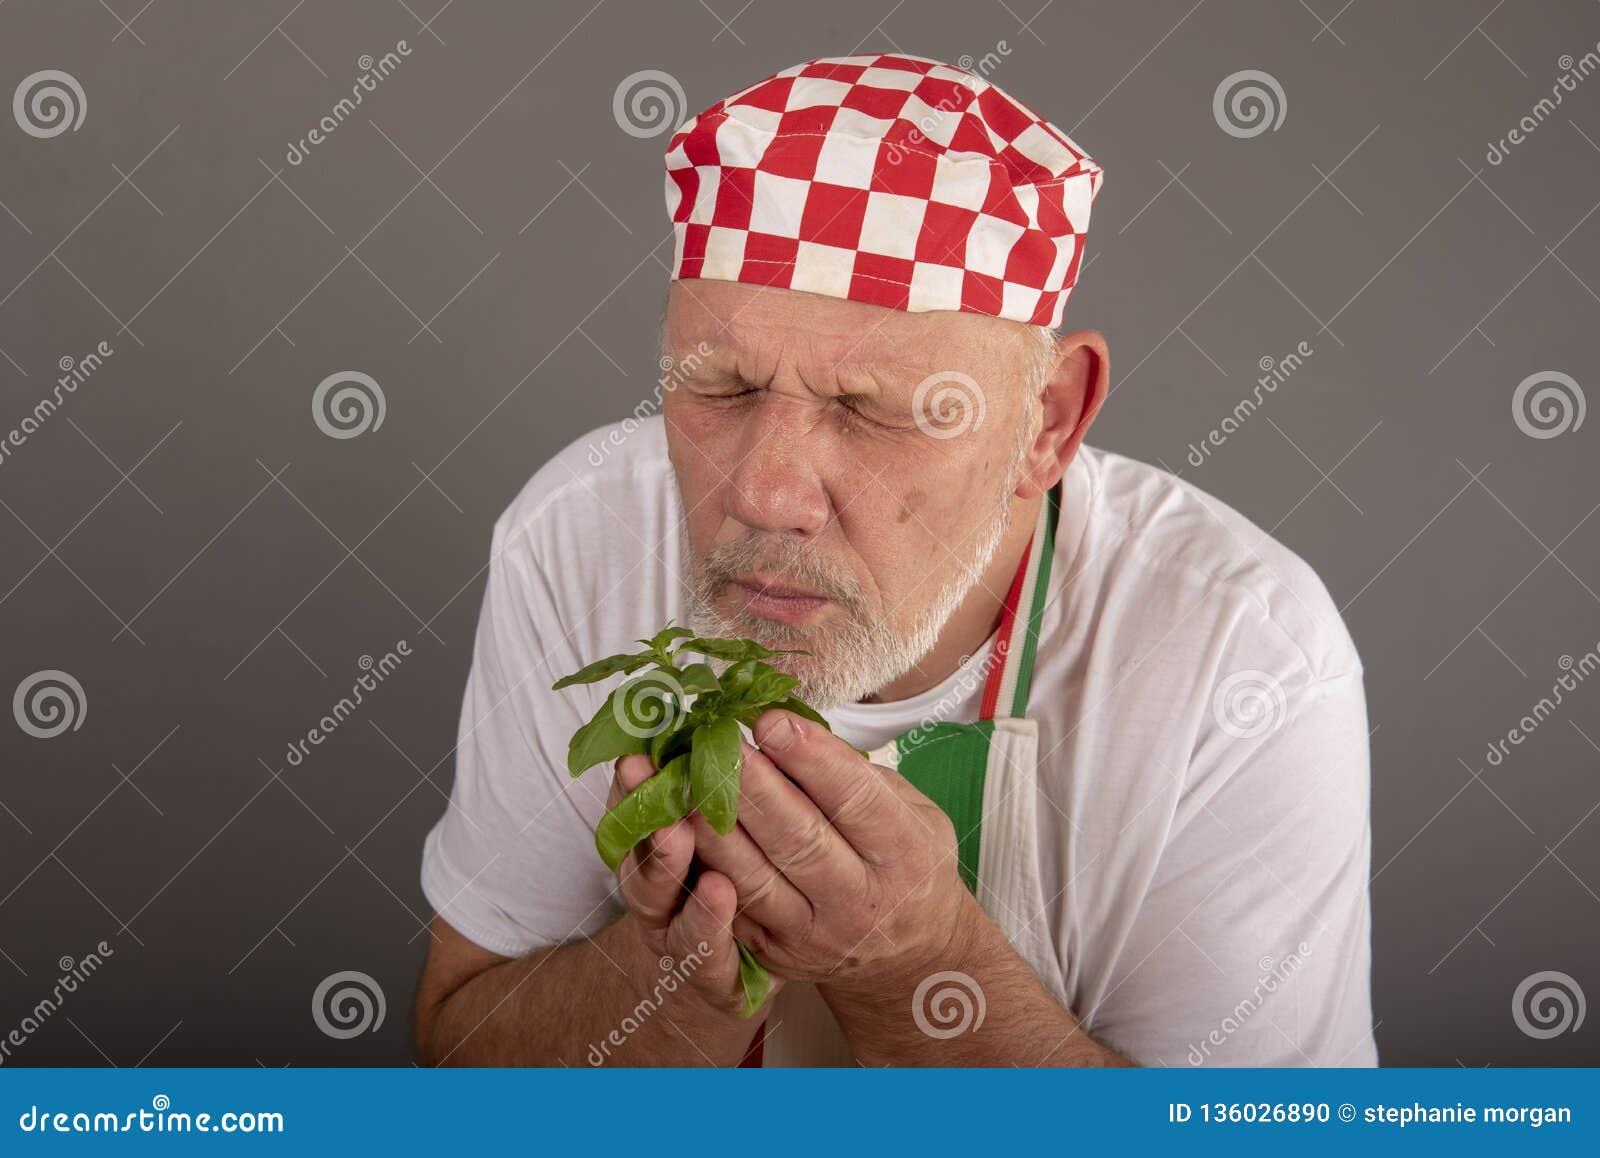 Mature Italian chef smelling basil leaves